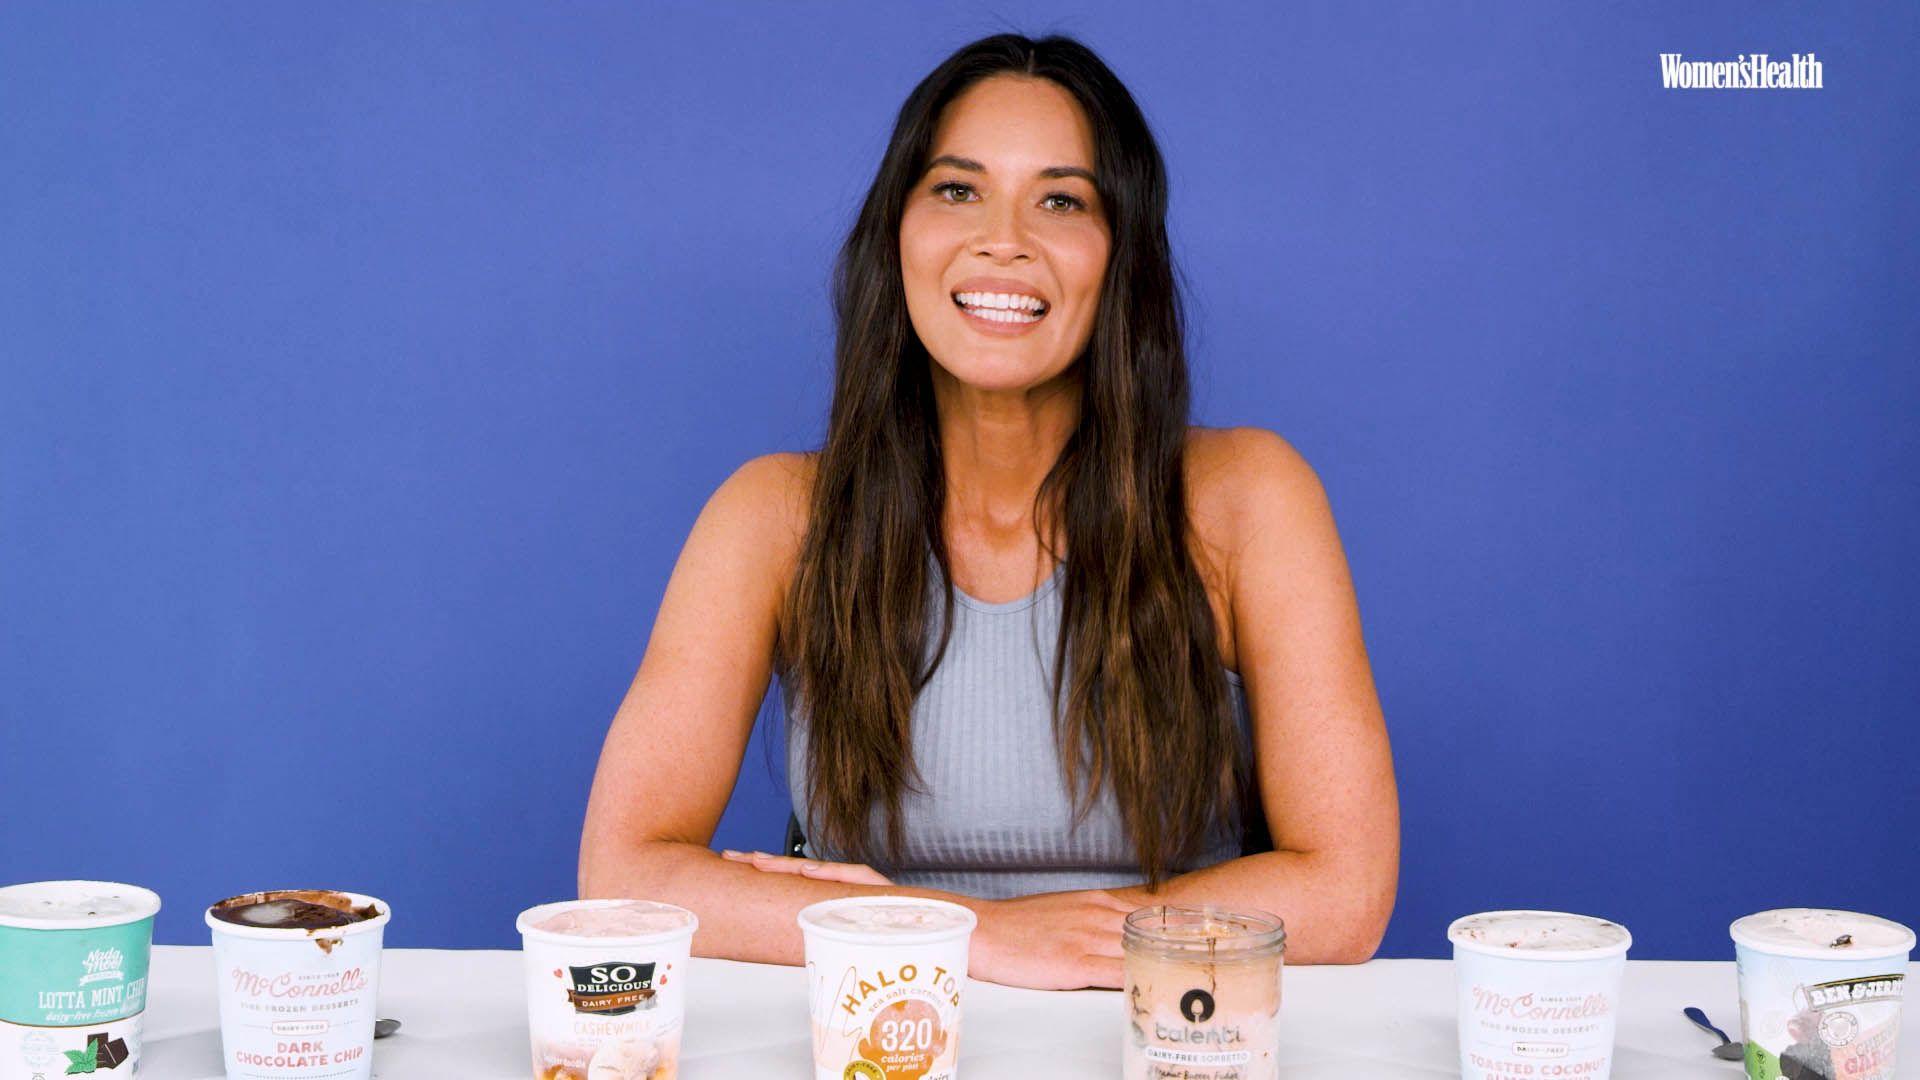 Watch Actress Olivia Munn Taste-Test Vegan Ice Creams